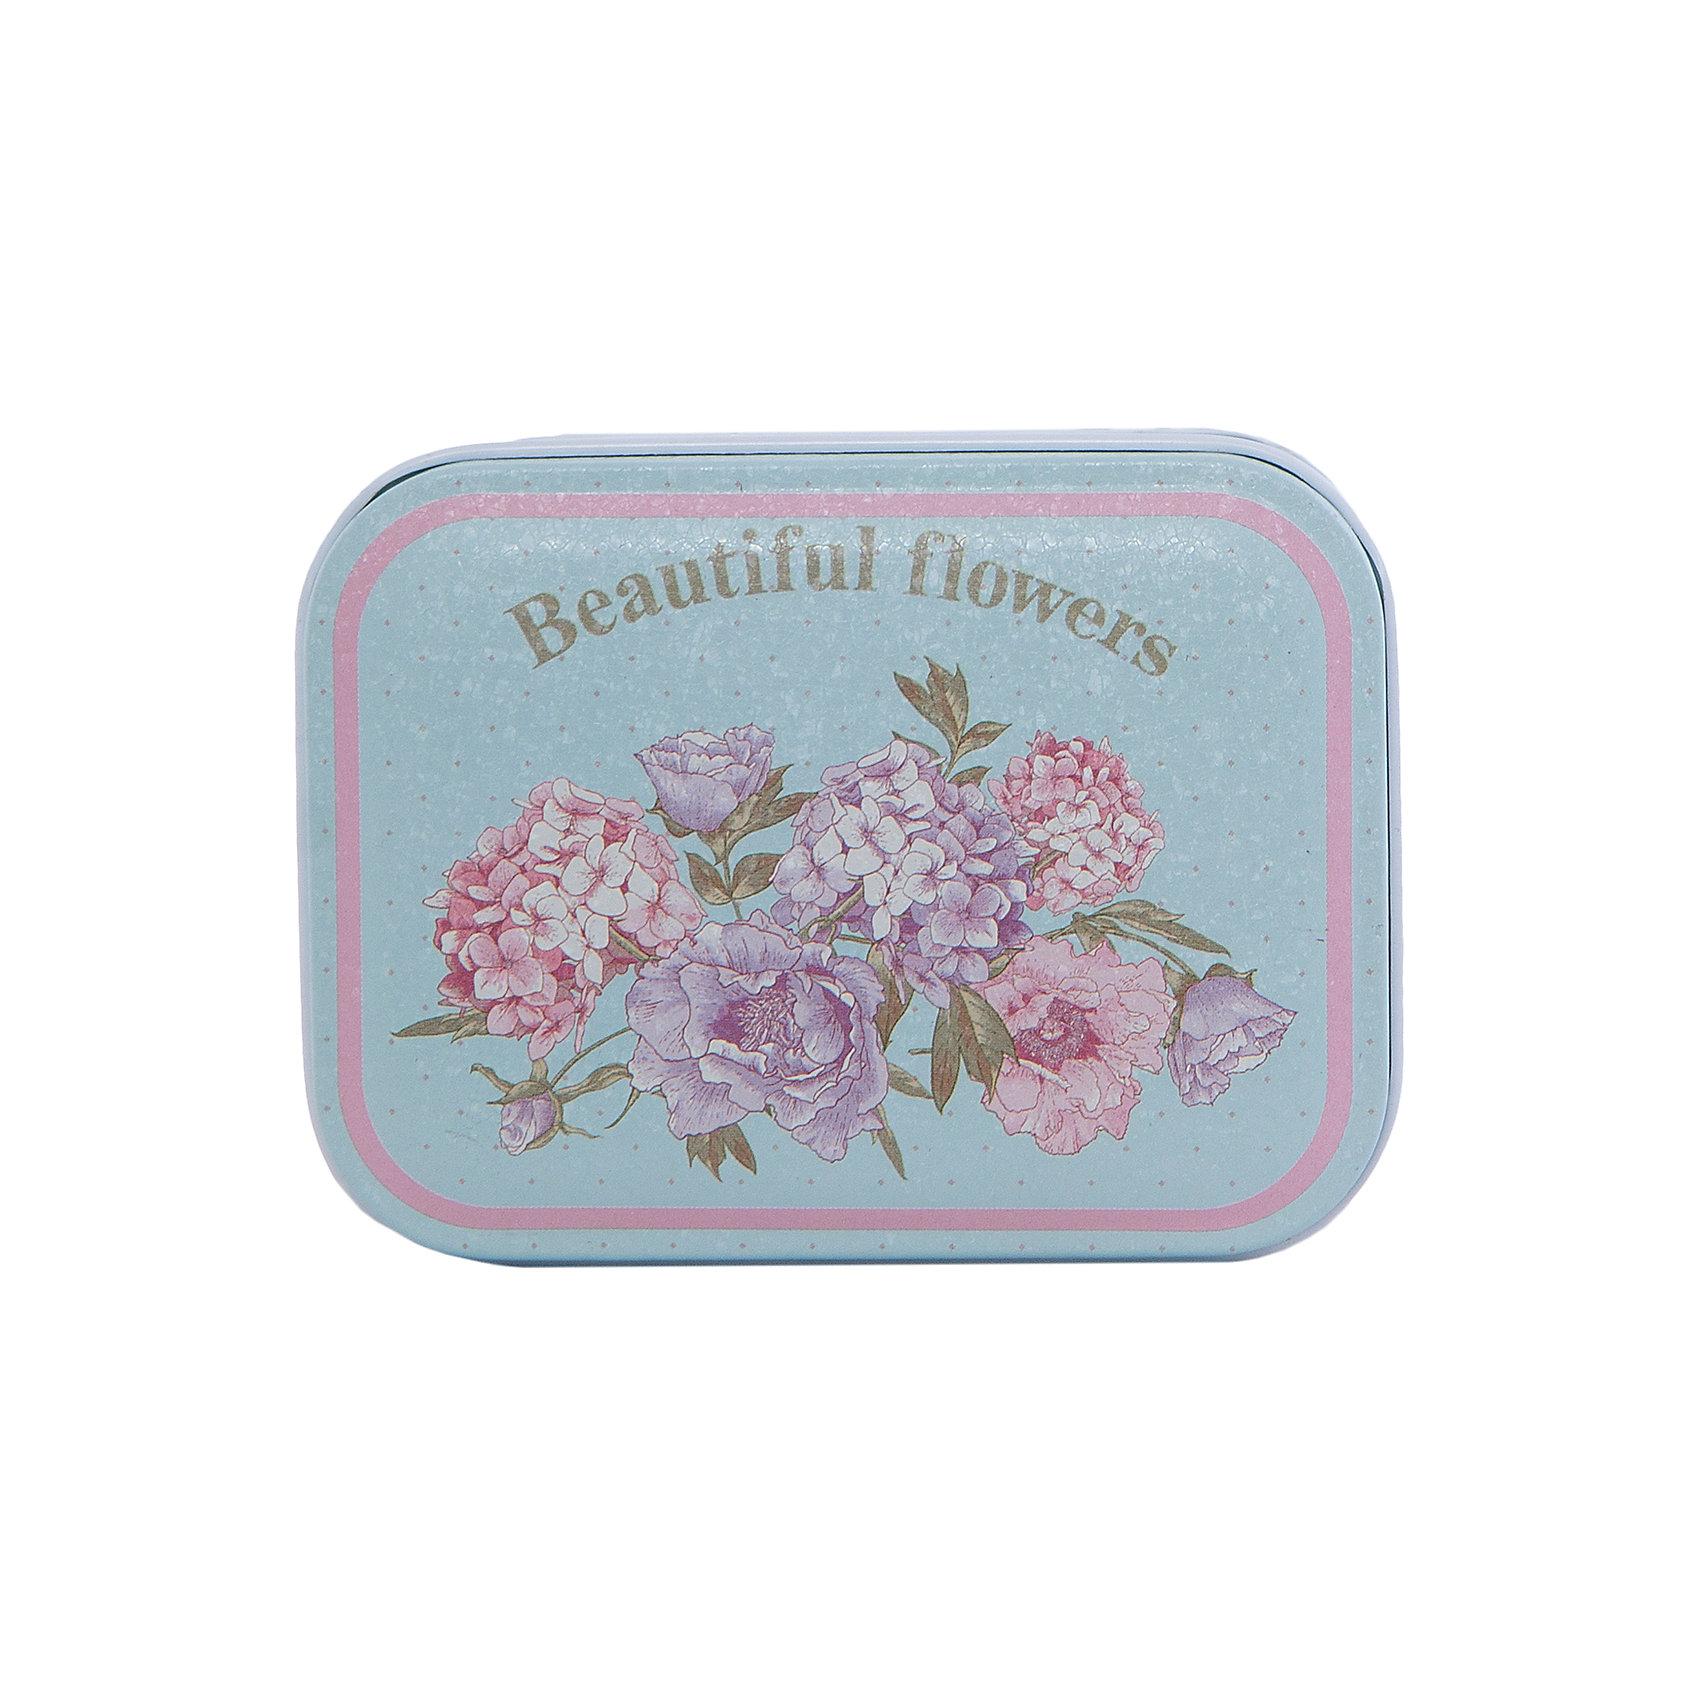 Феникс-Презент Коробка для безделушек и мелочей Красивые цветы  10.5*8*6, Феникс-Презент феникс презент